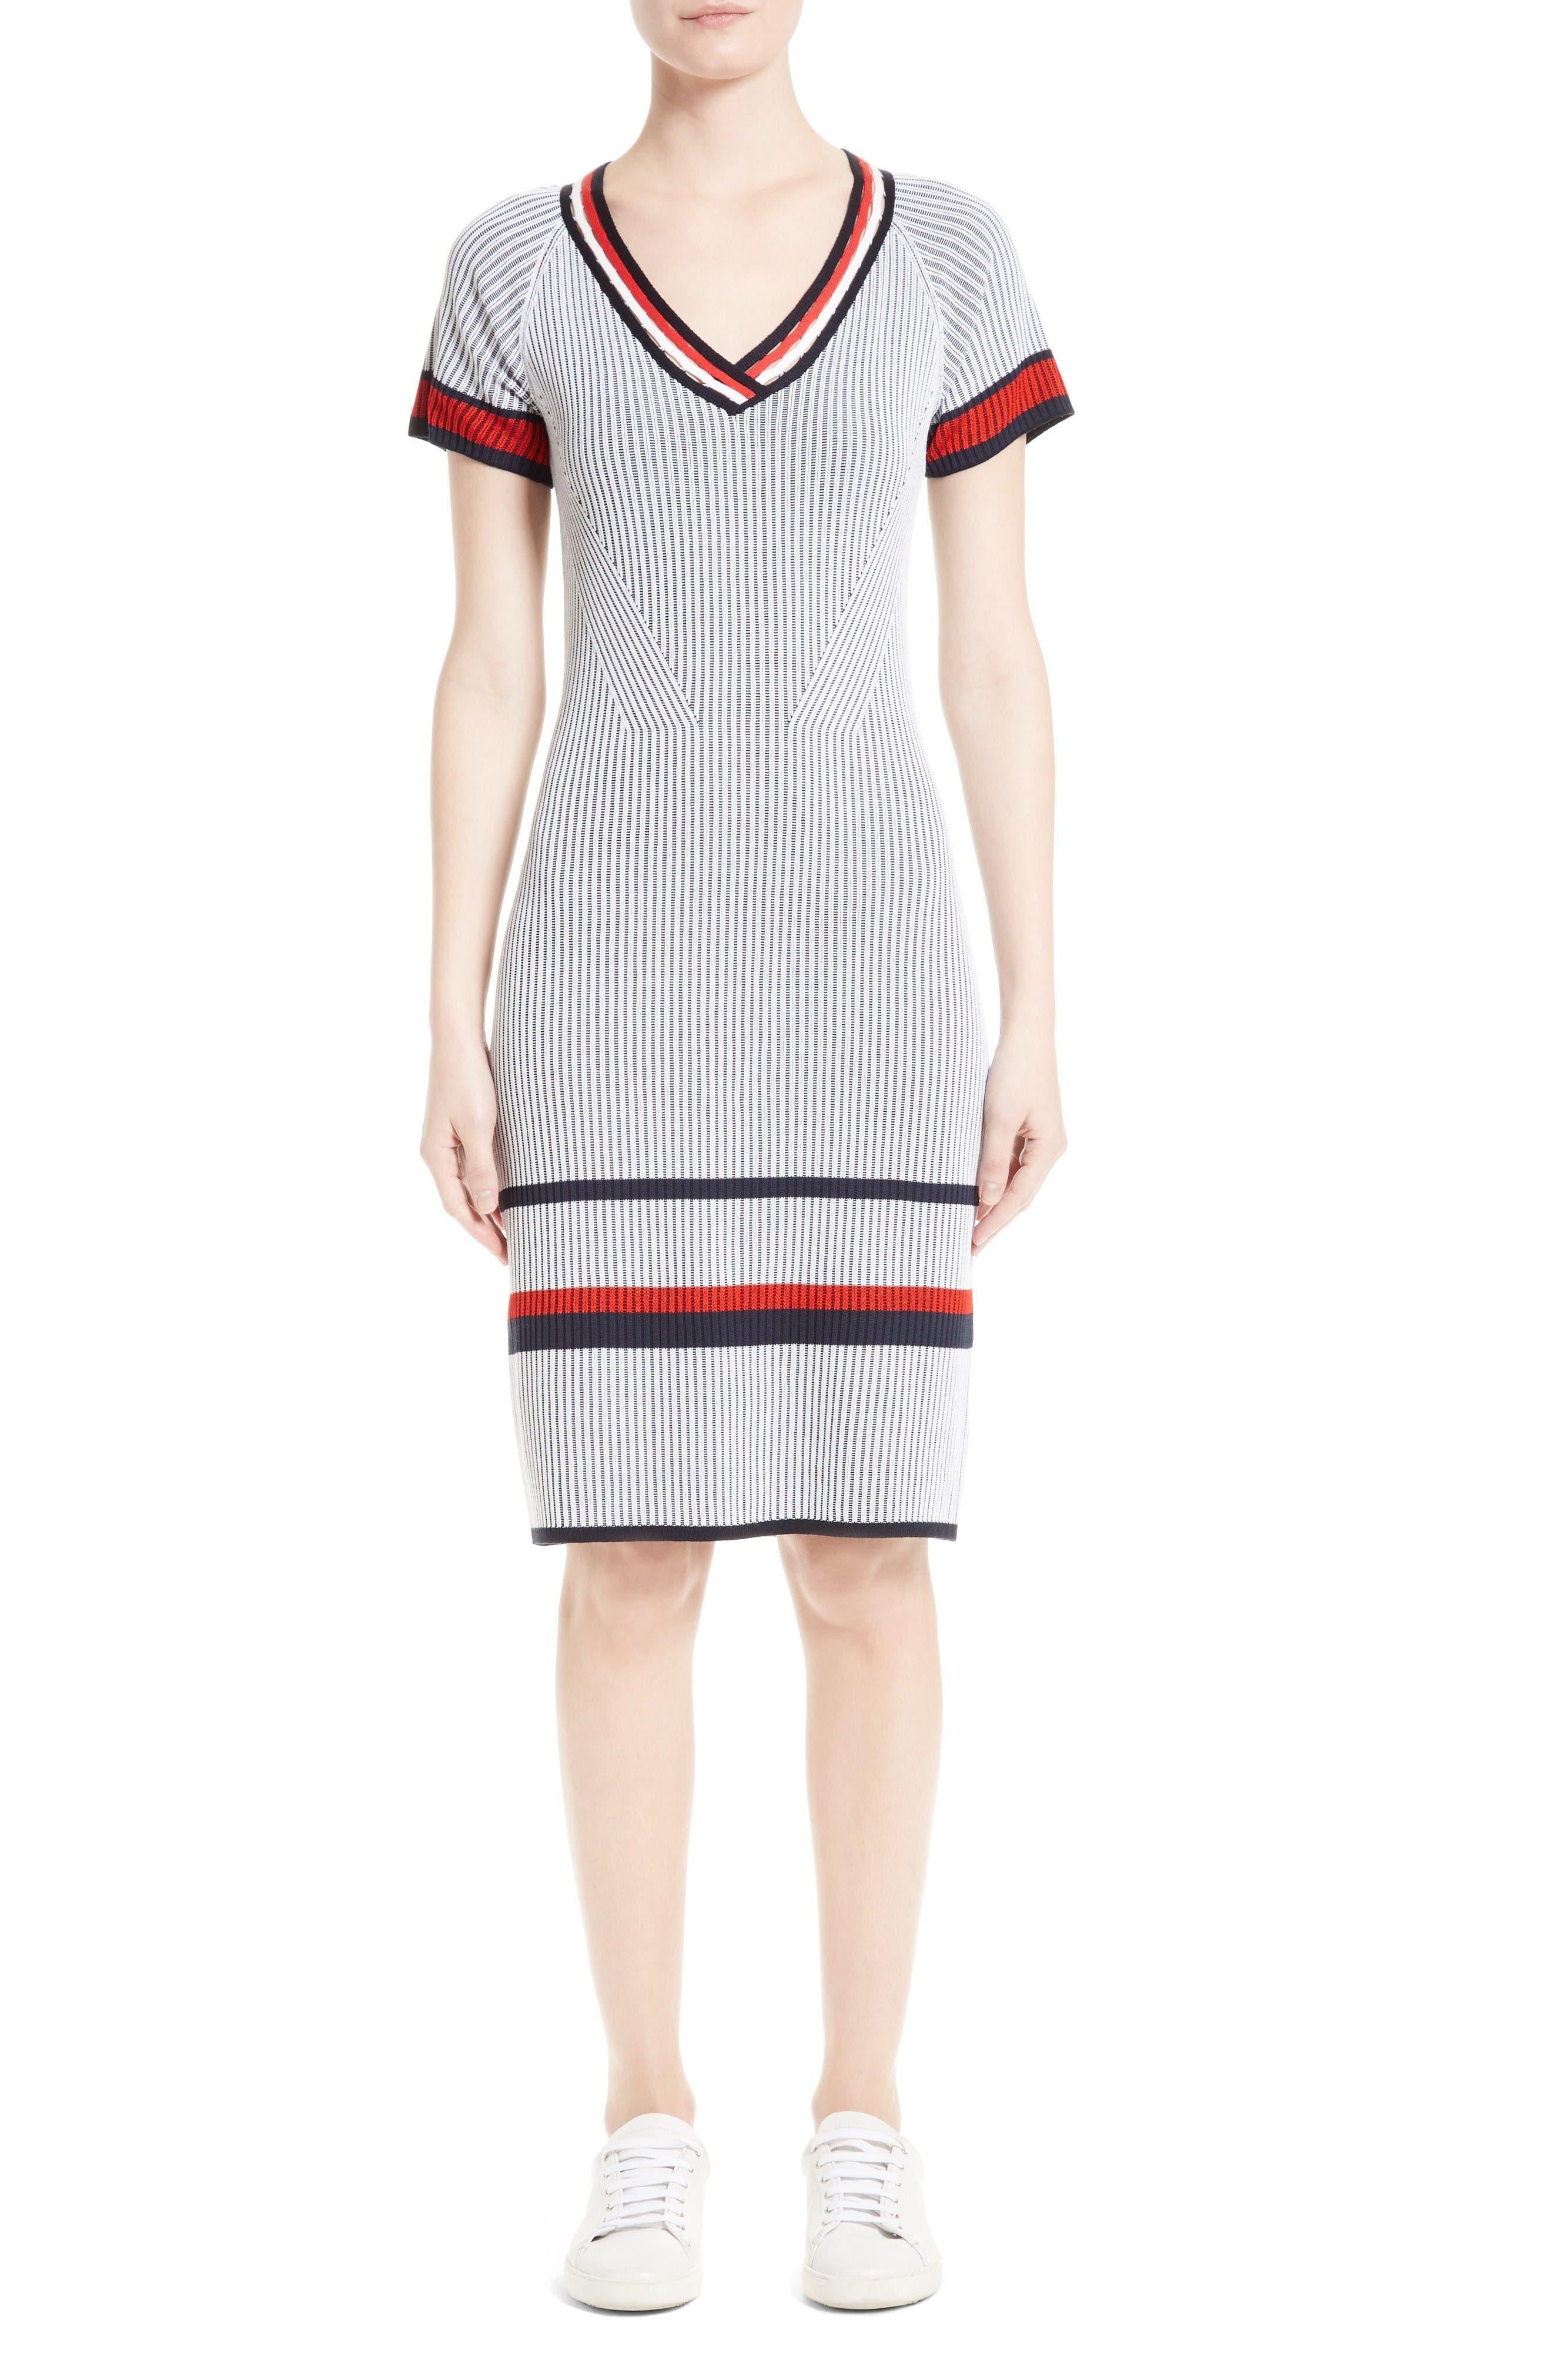 Main Image - St. John Collection Two-Tone Rib Knit Dress